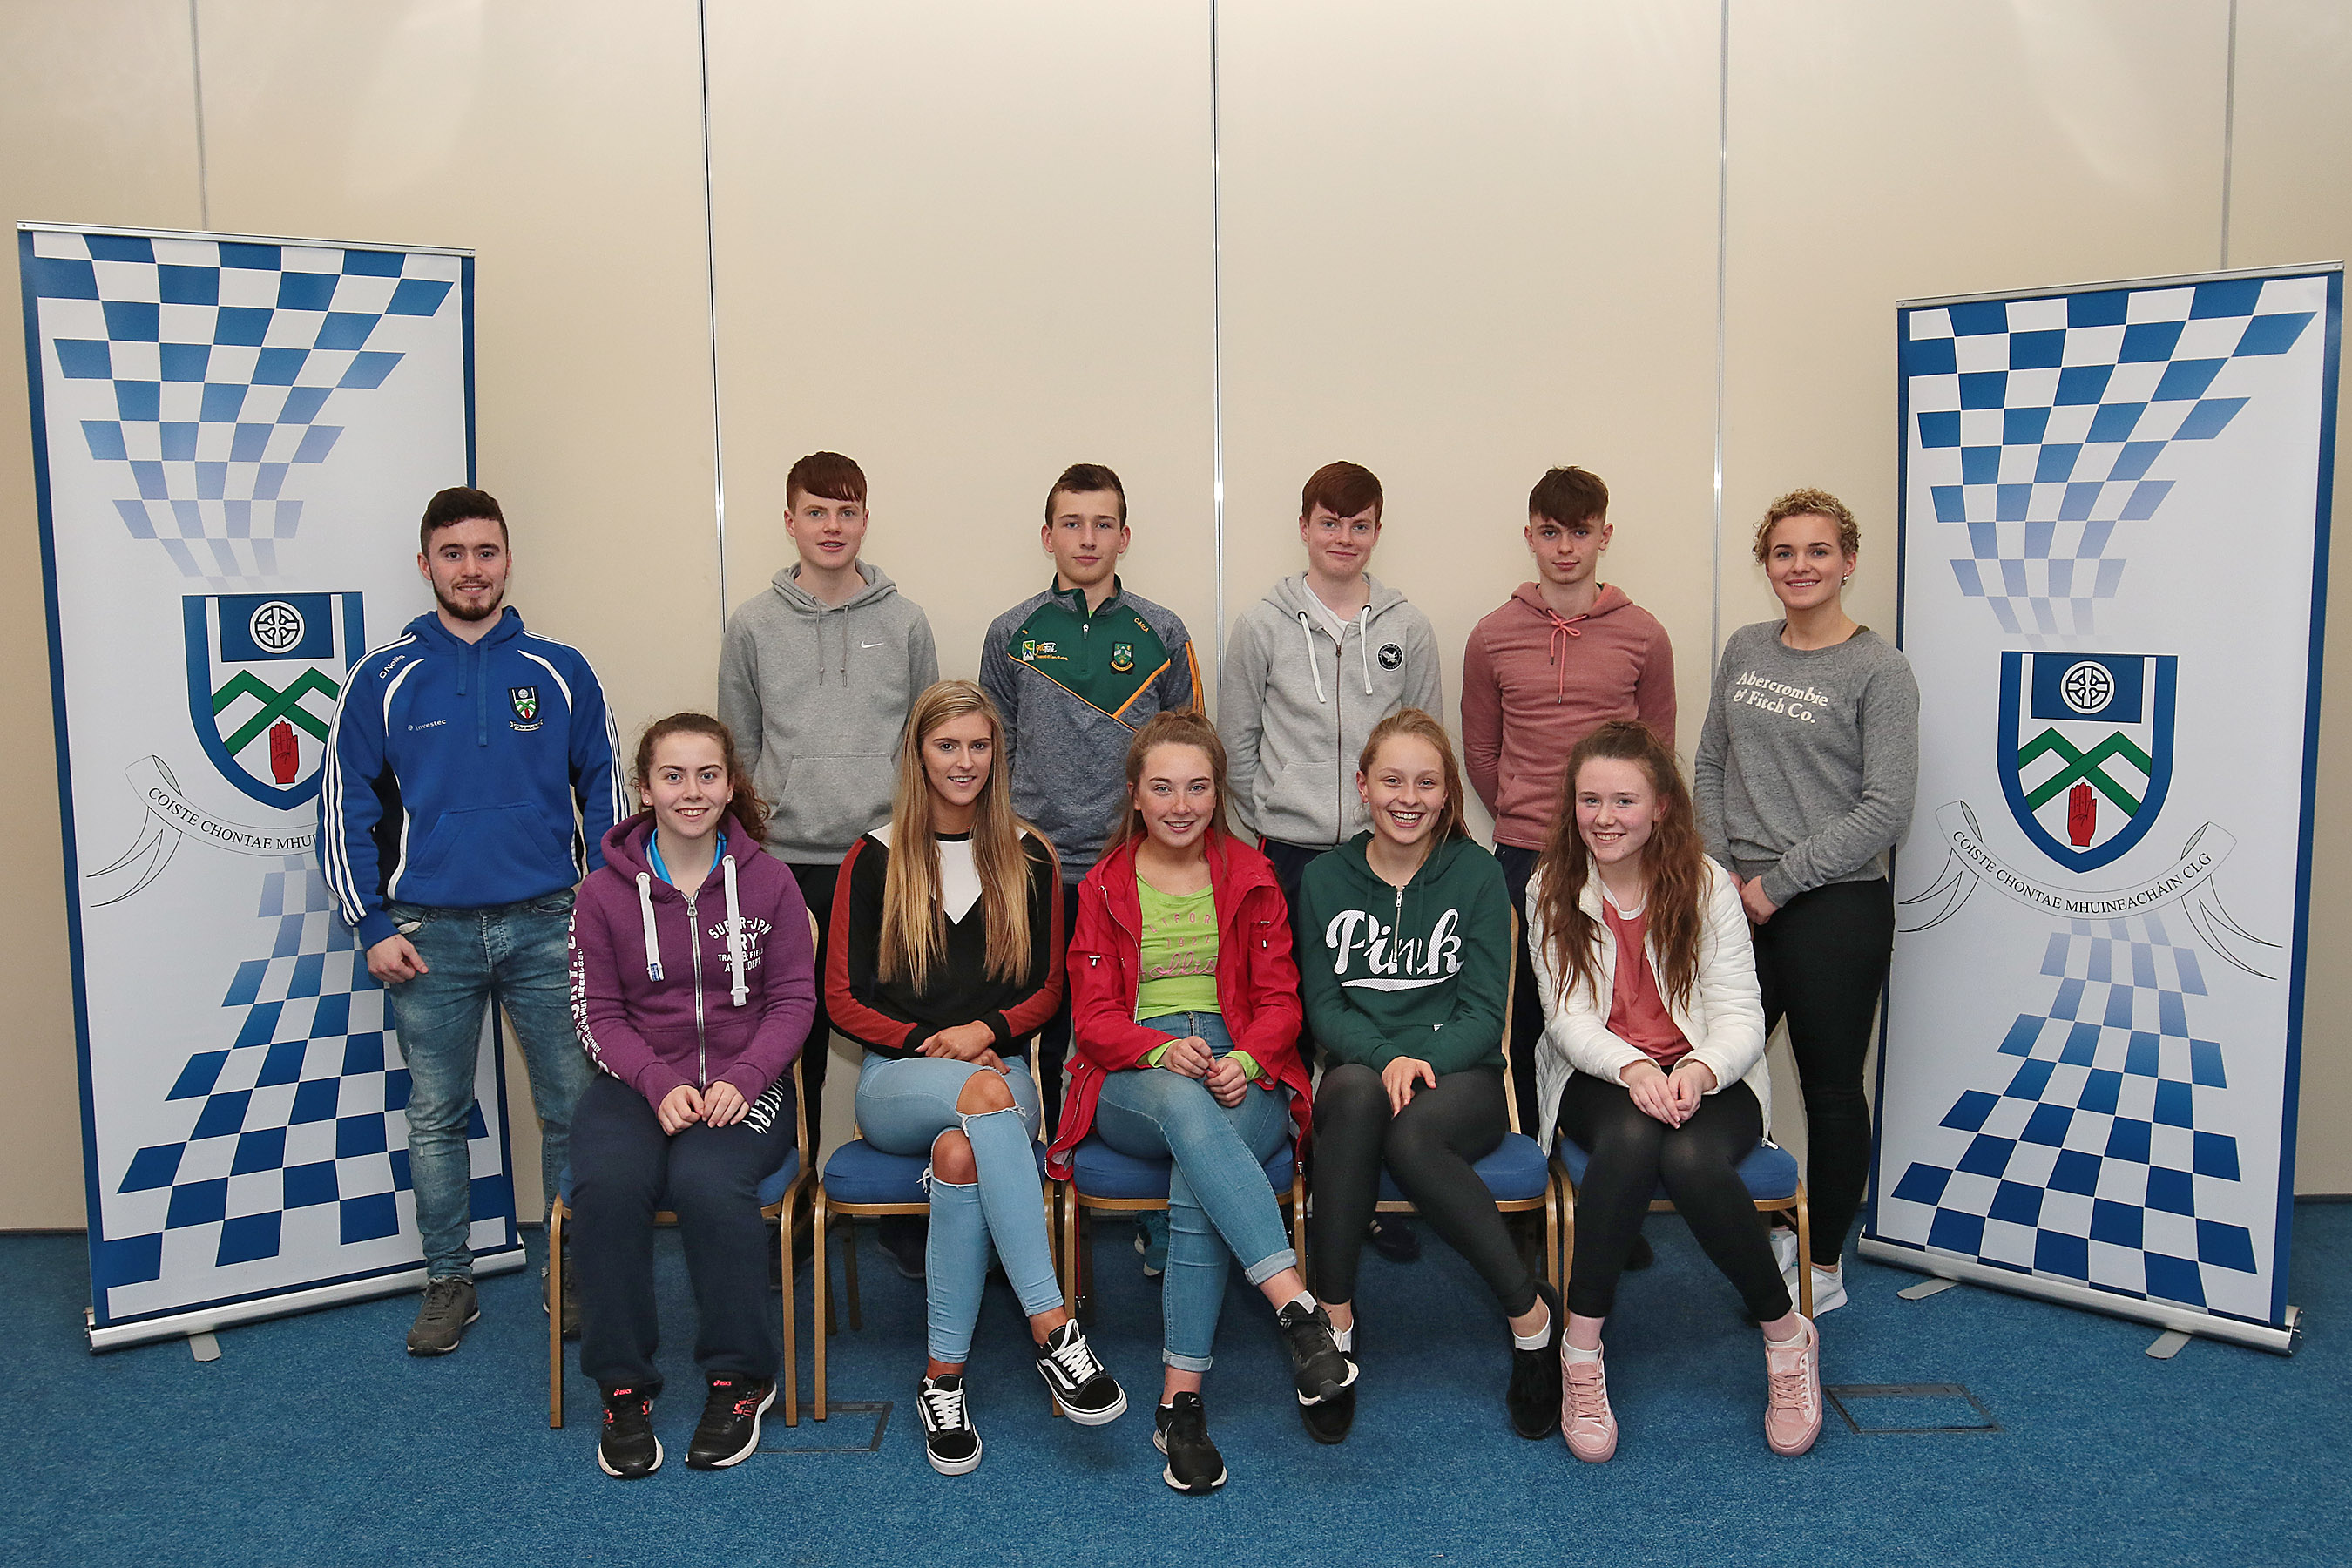 Dermot Earley Youth Leadership Launched in Monaghan GAA